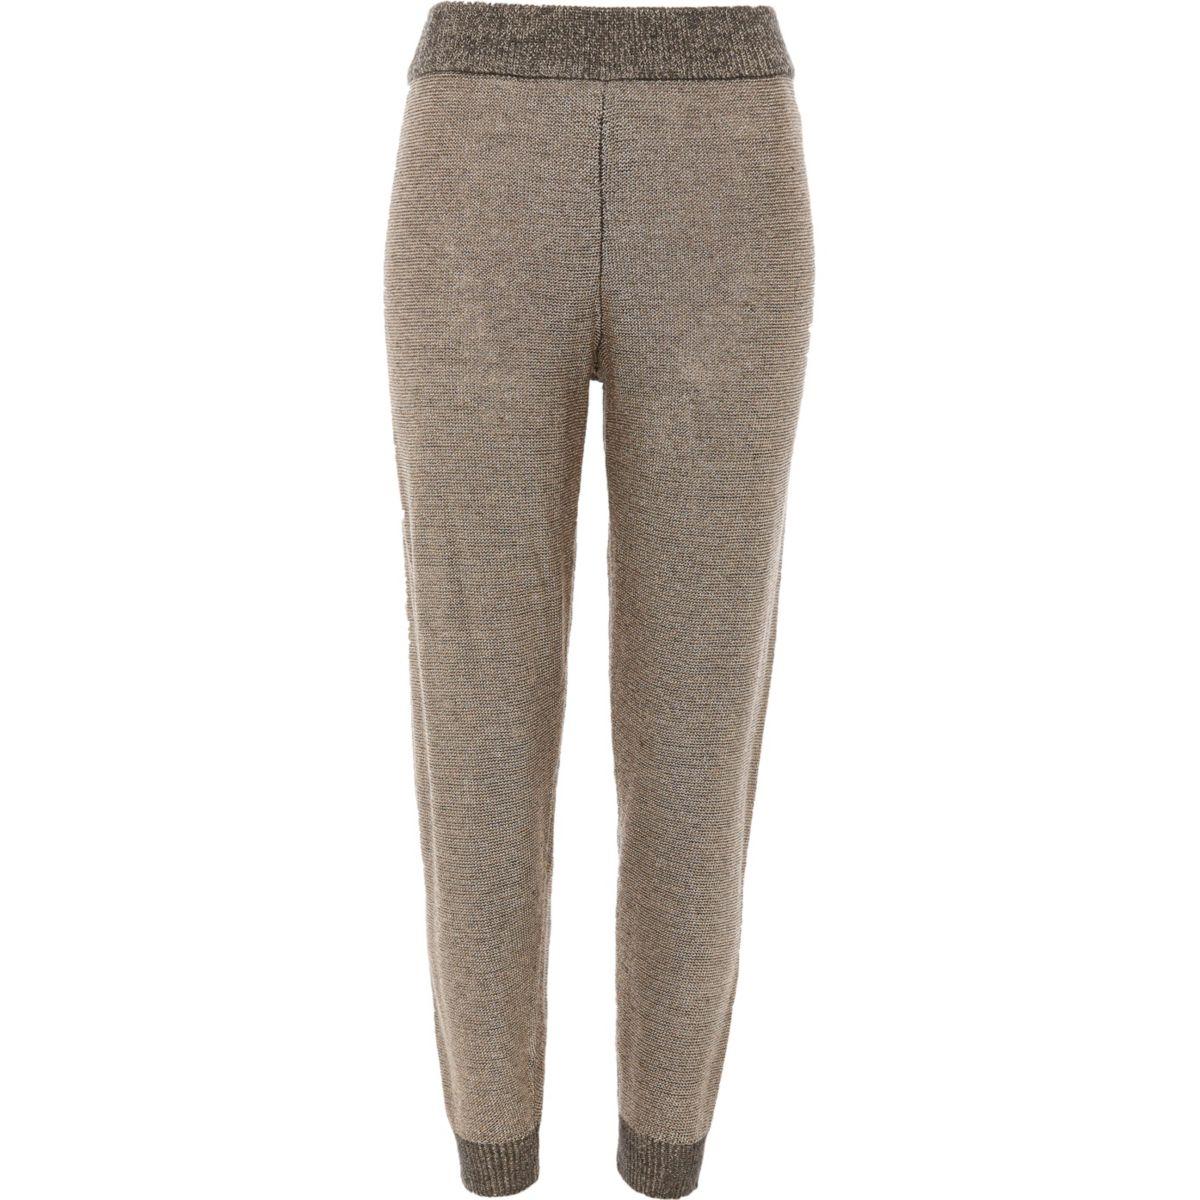 Dark grey metallic knit joggers